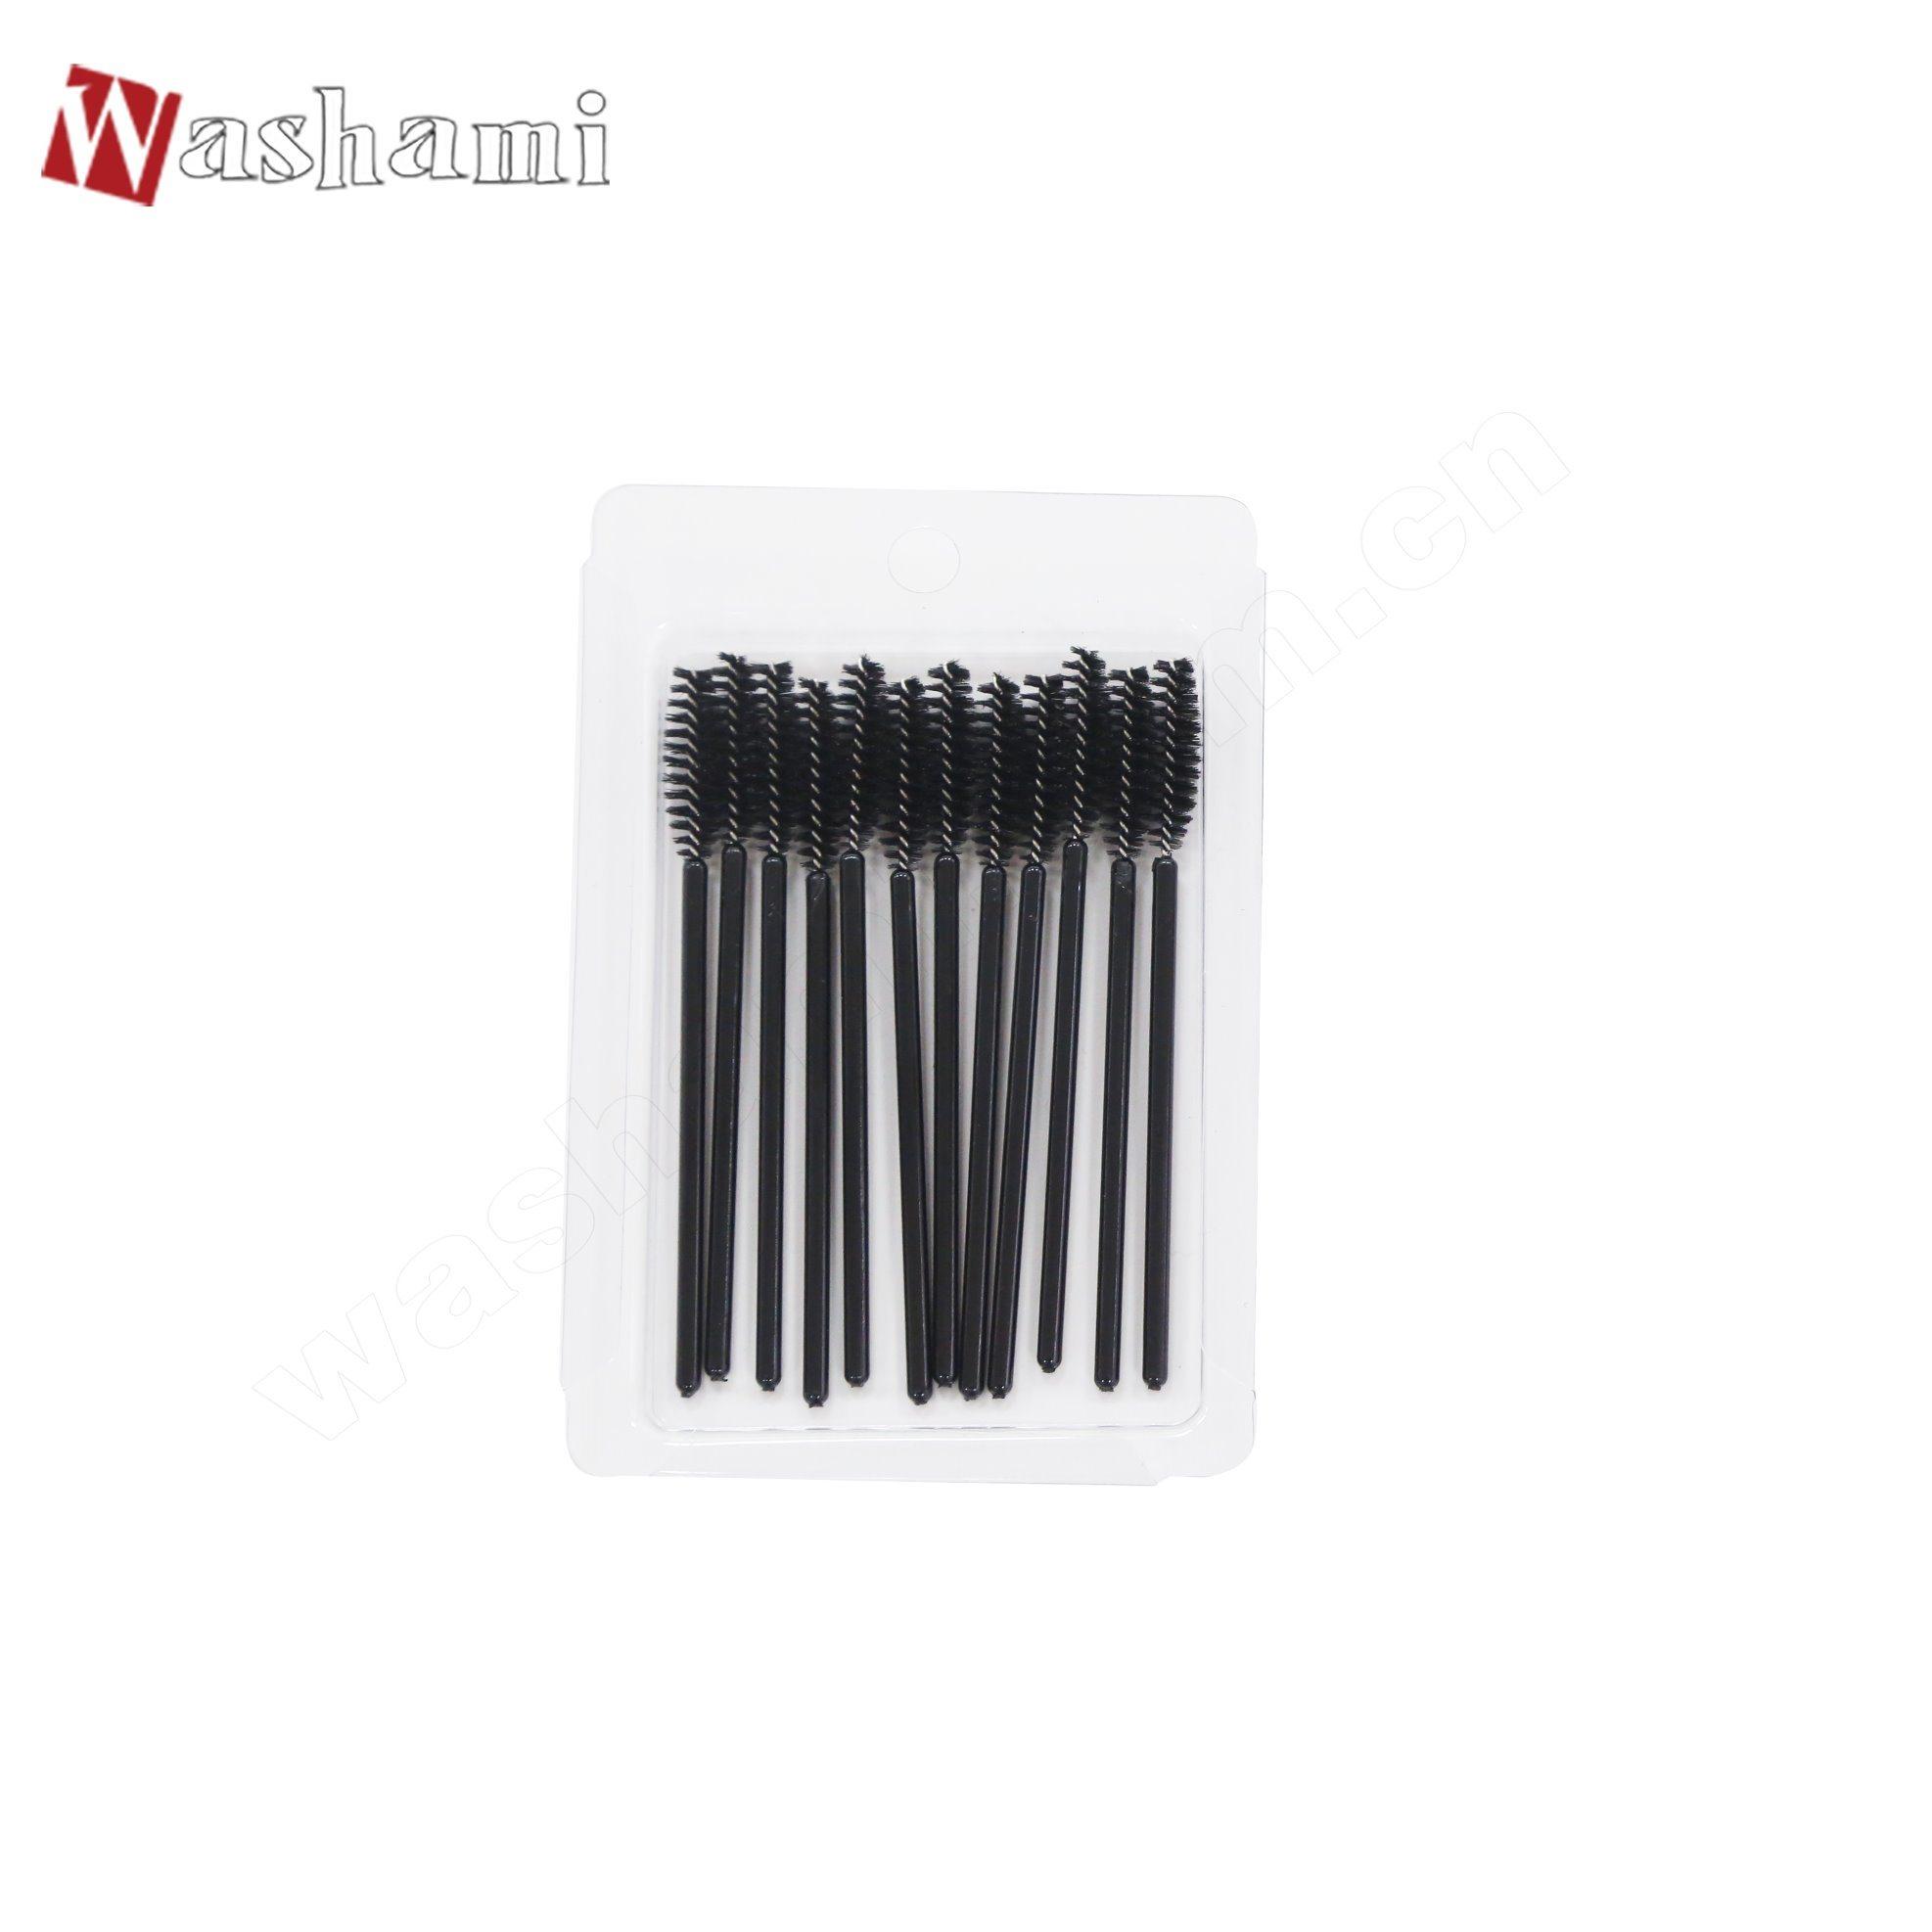 Washami 12PCS Mascara Brush Custom Makeup Brush Set